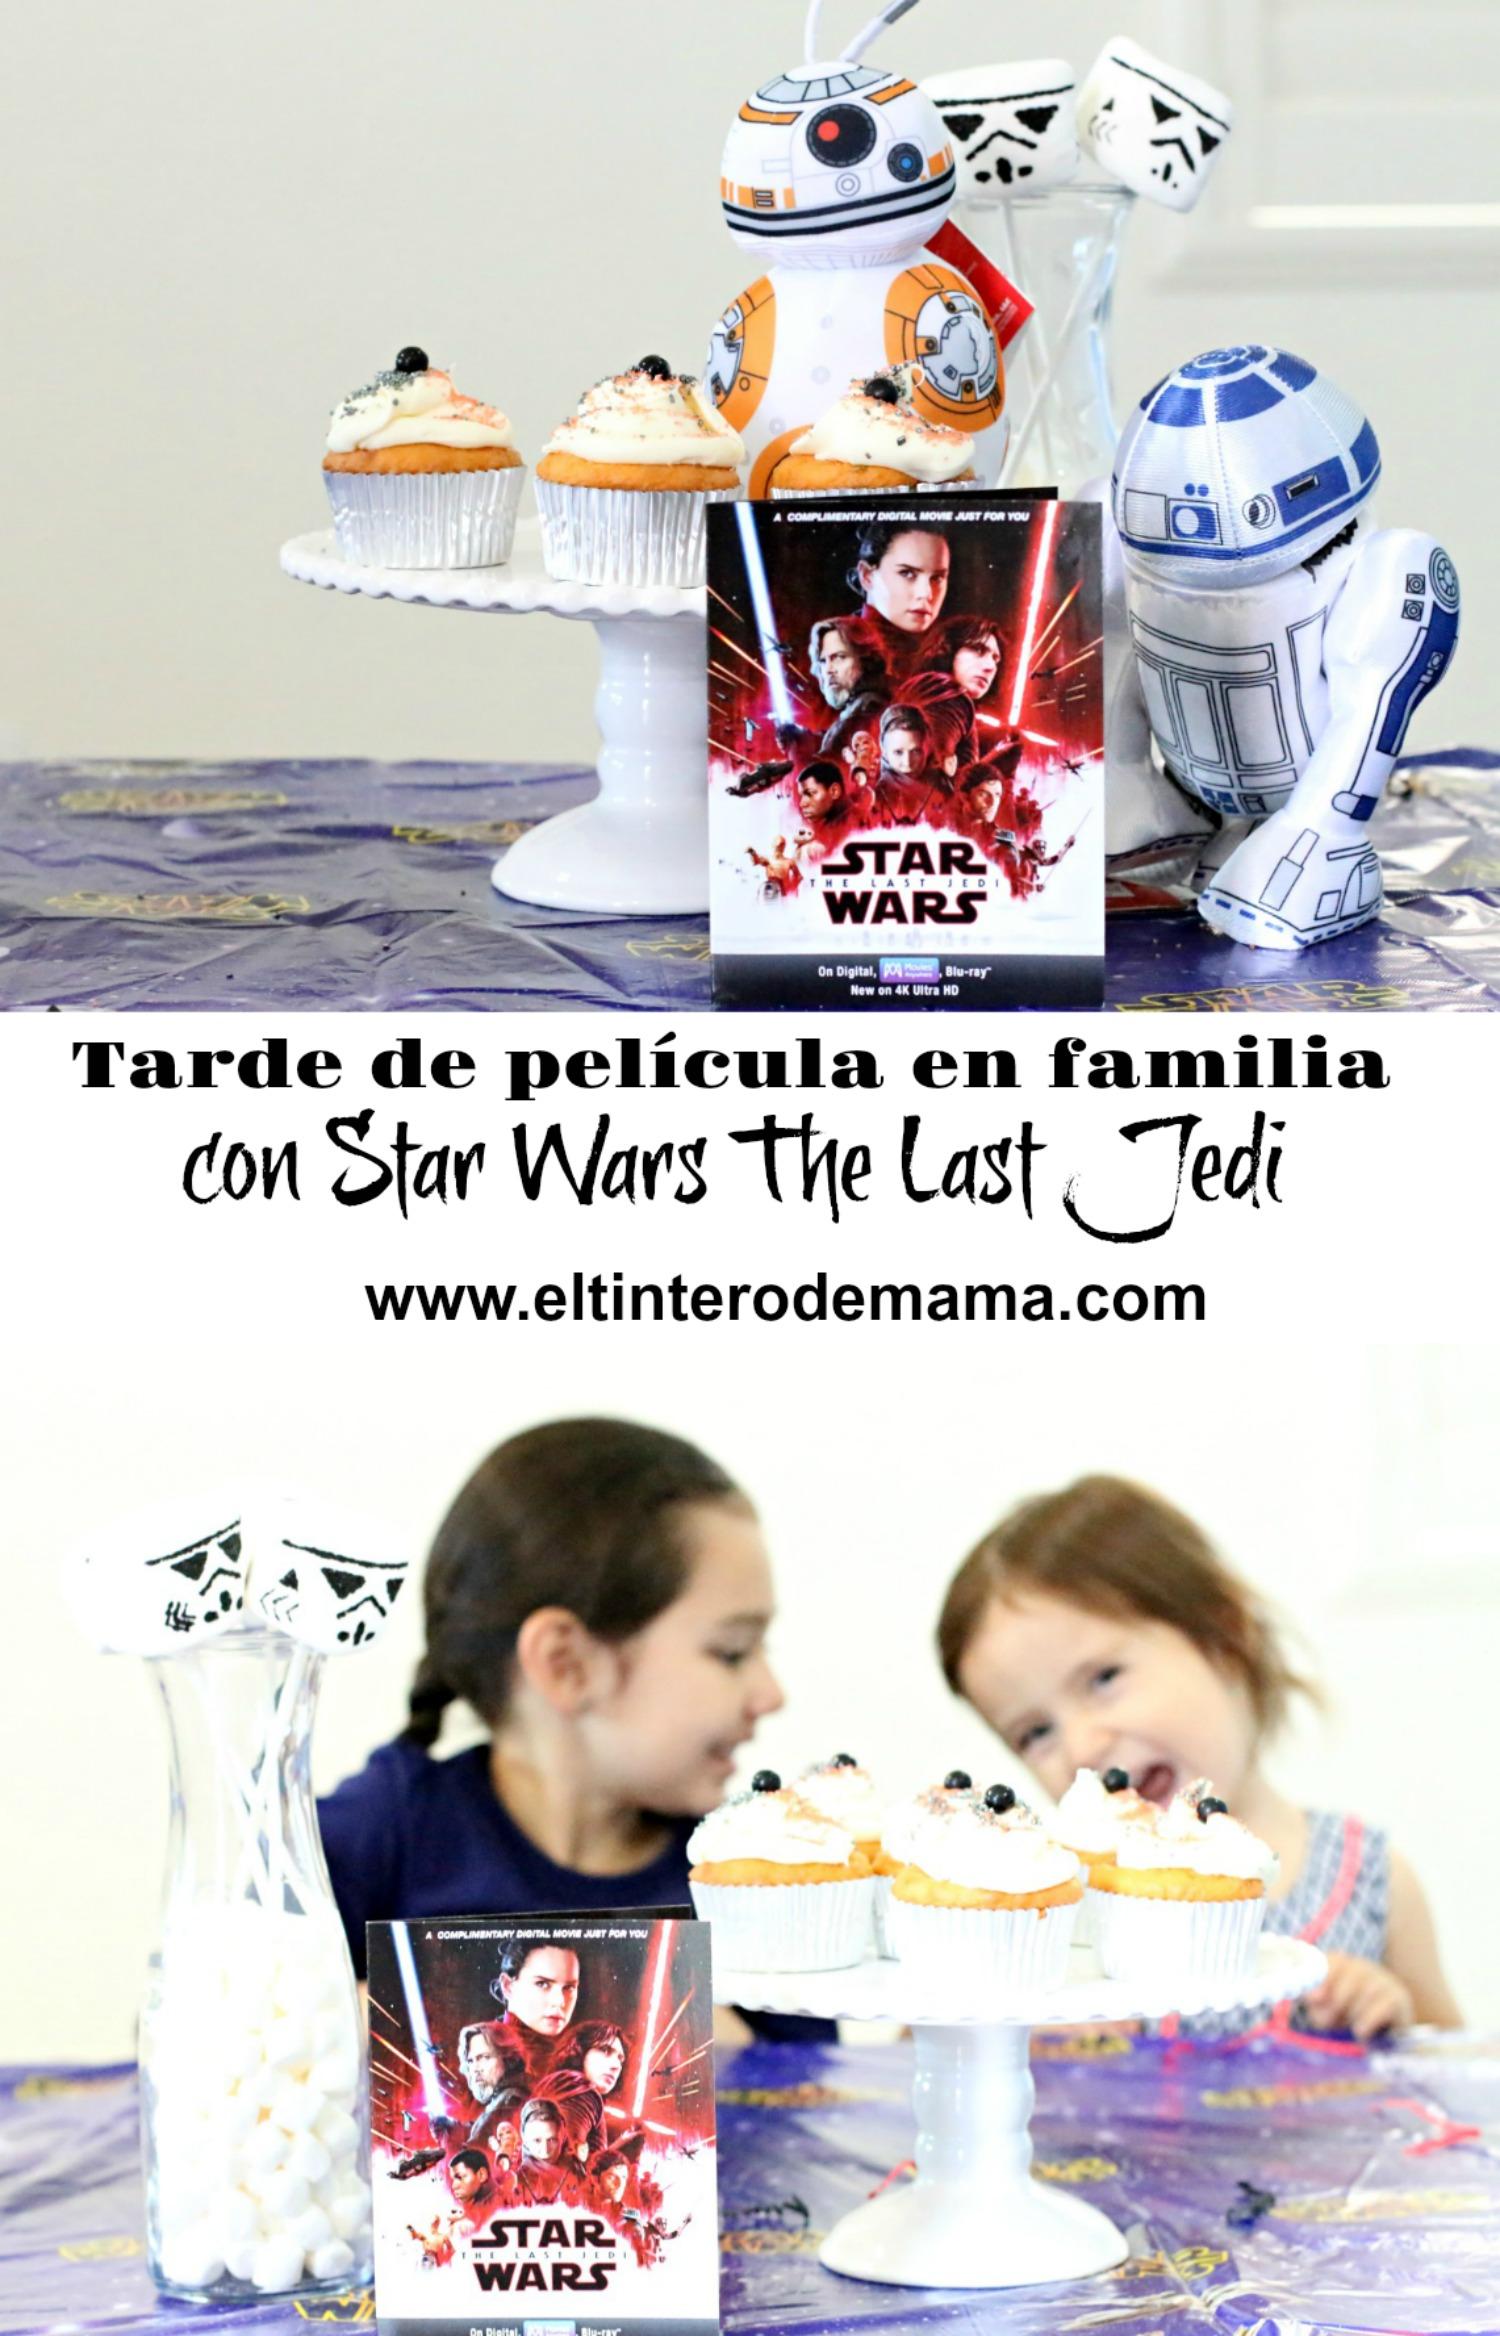 tarde-de-pelicula-en-familia-con-star-wars-the-last-jedi